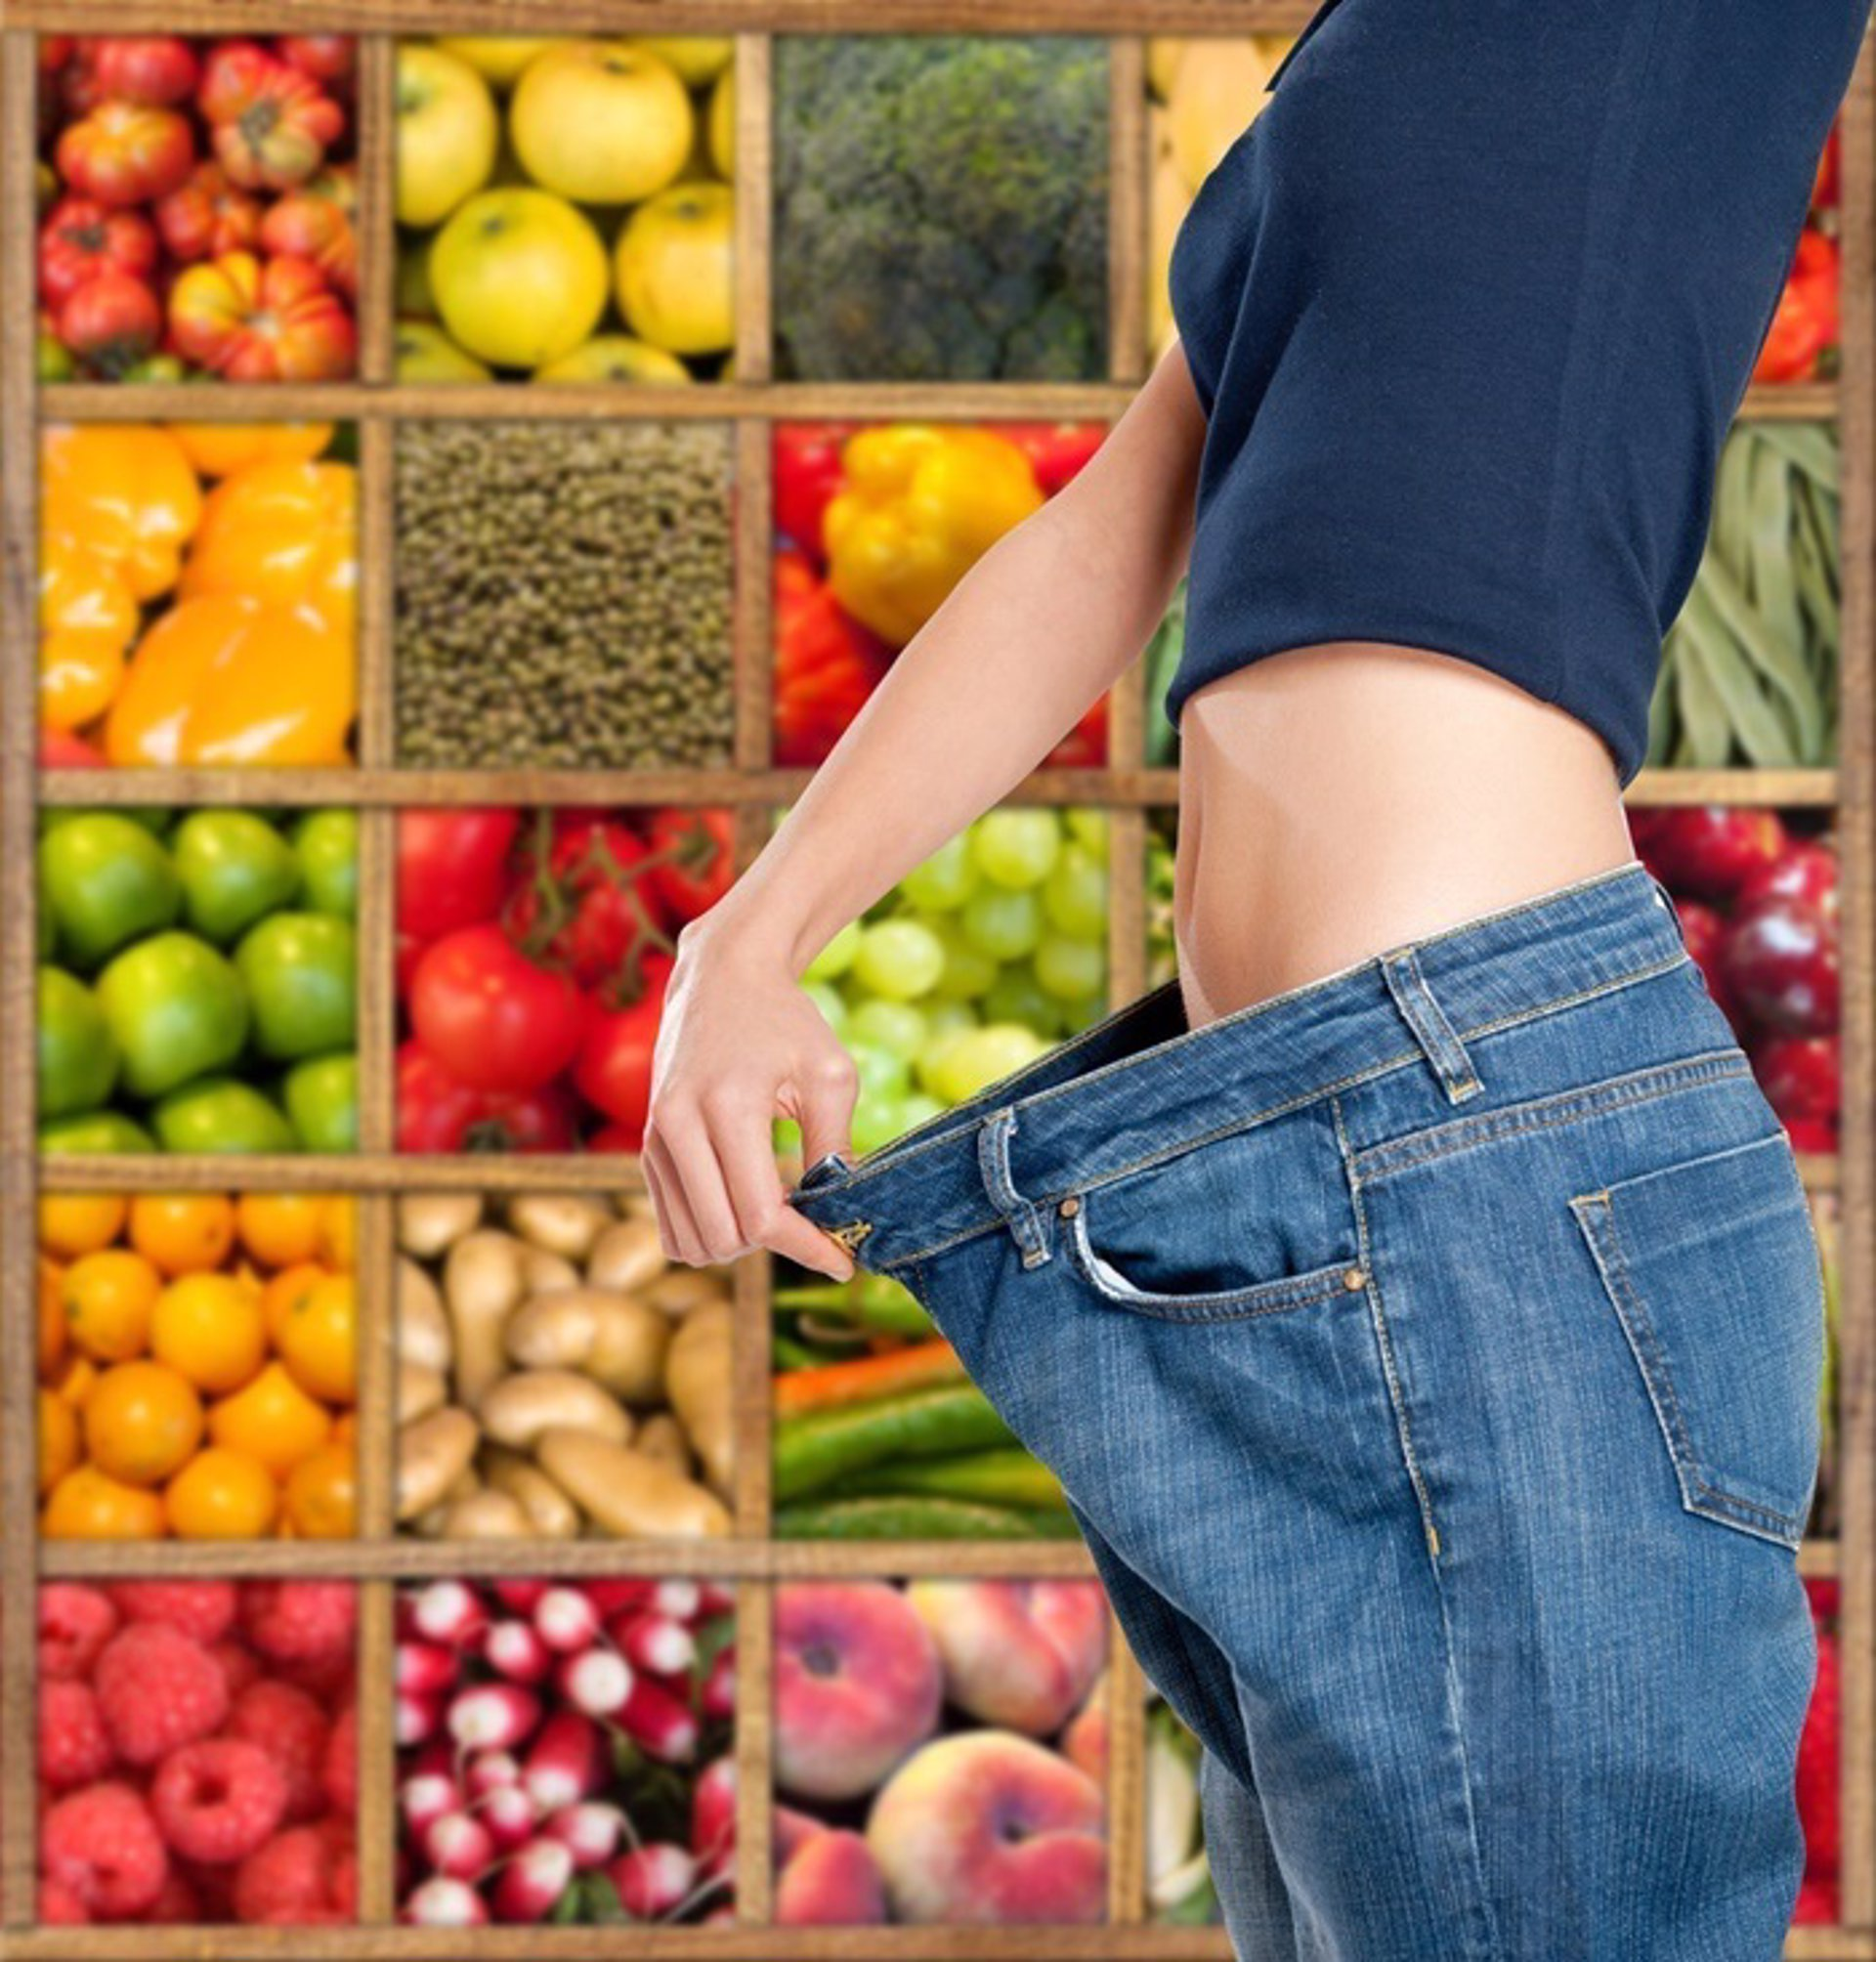 Dieta para bajar de peso semana numero tres picture 2